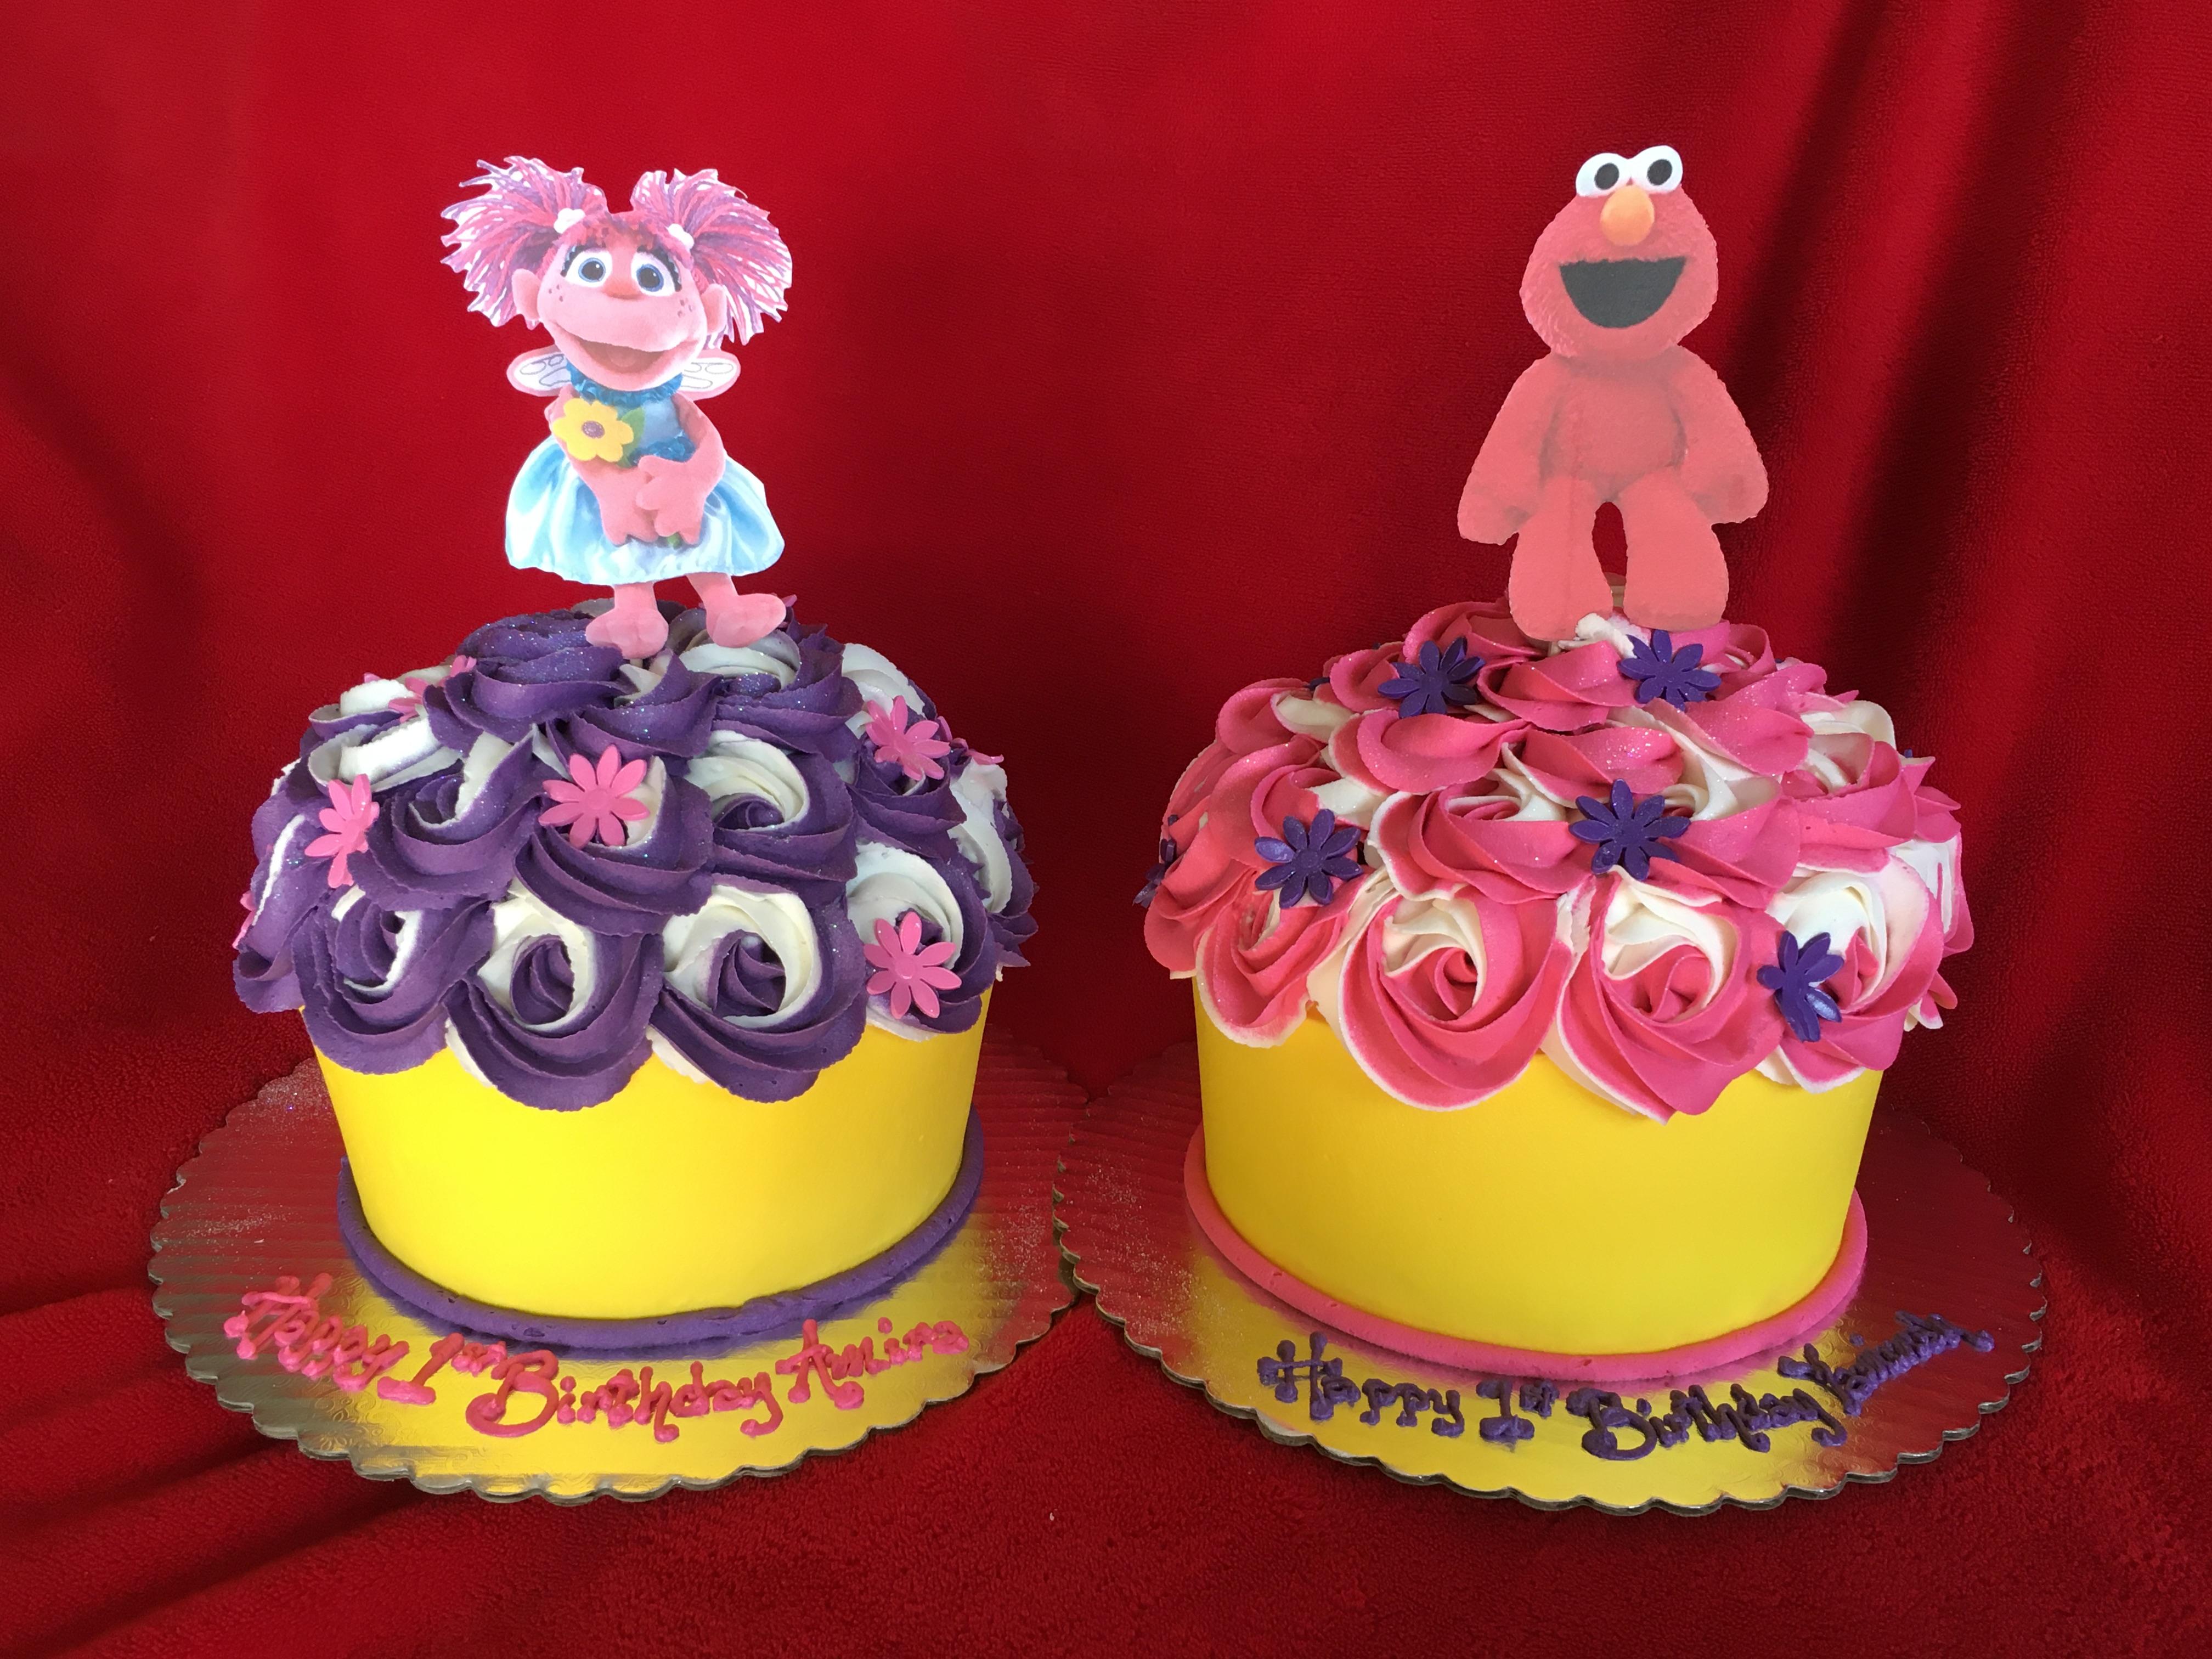 Elmo and Abby Cupcake Cakes